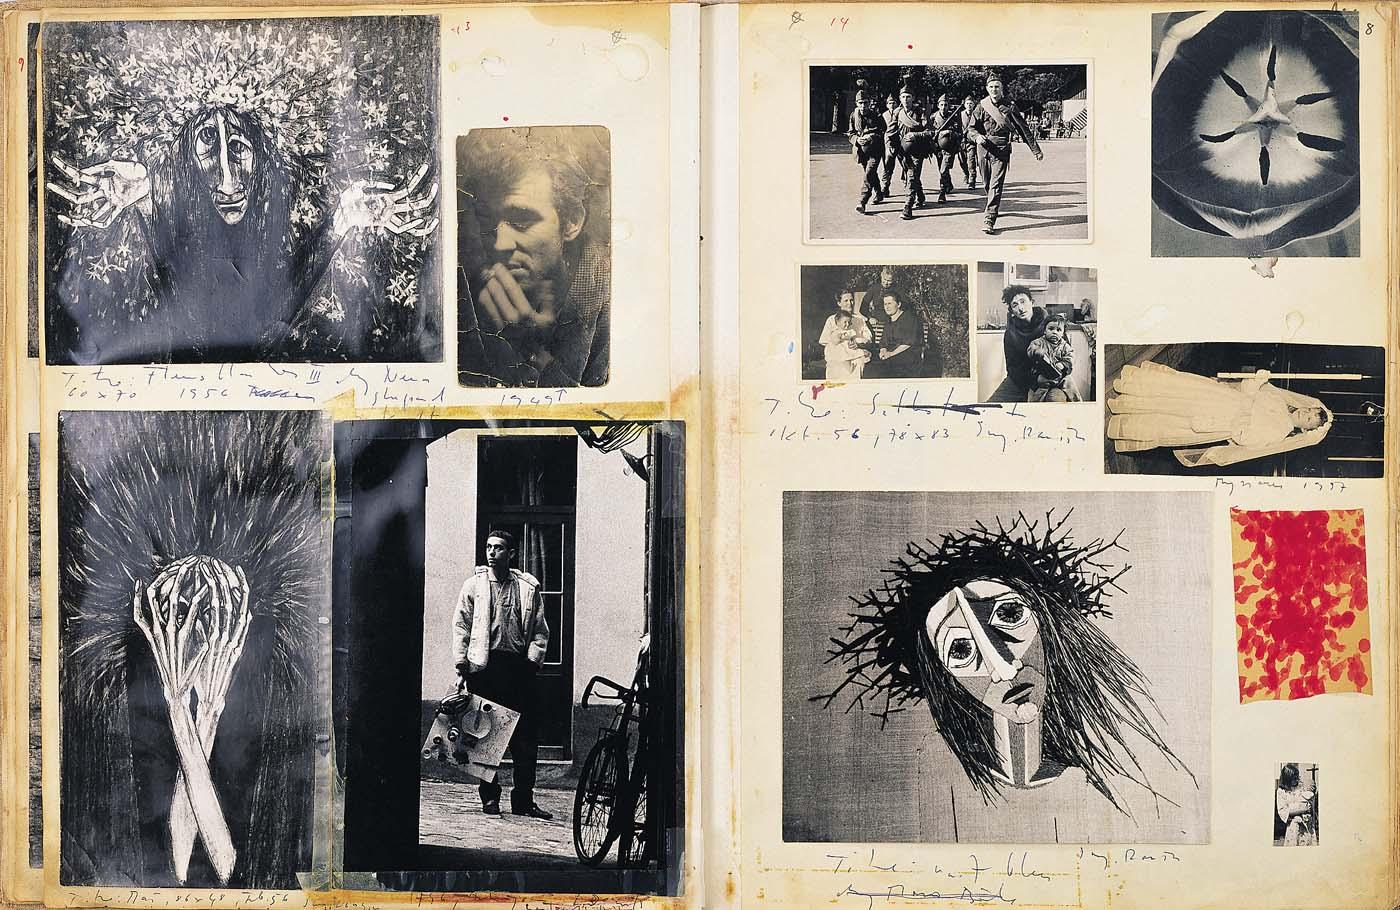 Eva Aeppli, Lebensbücher Band 1, 1954-1960